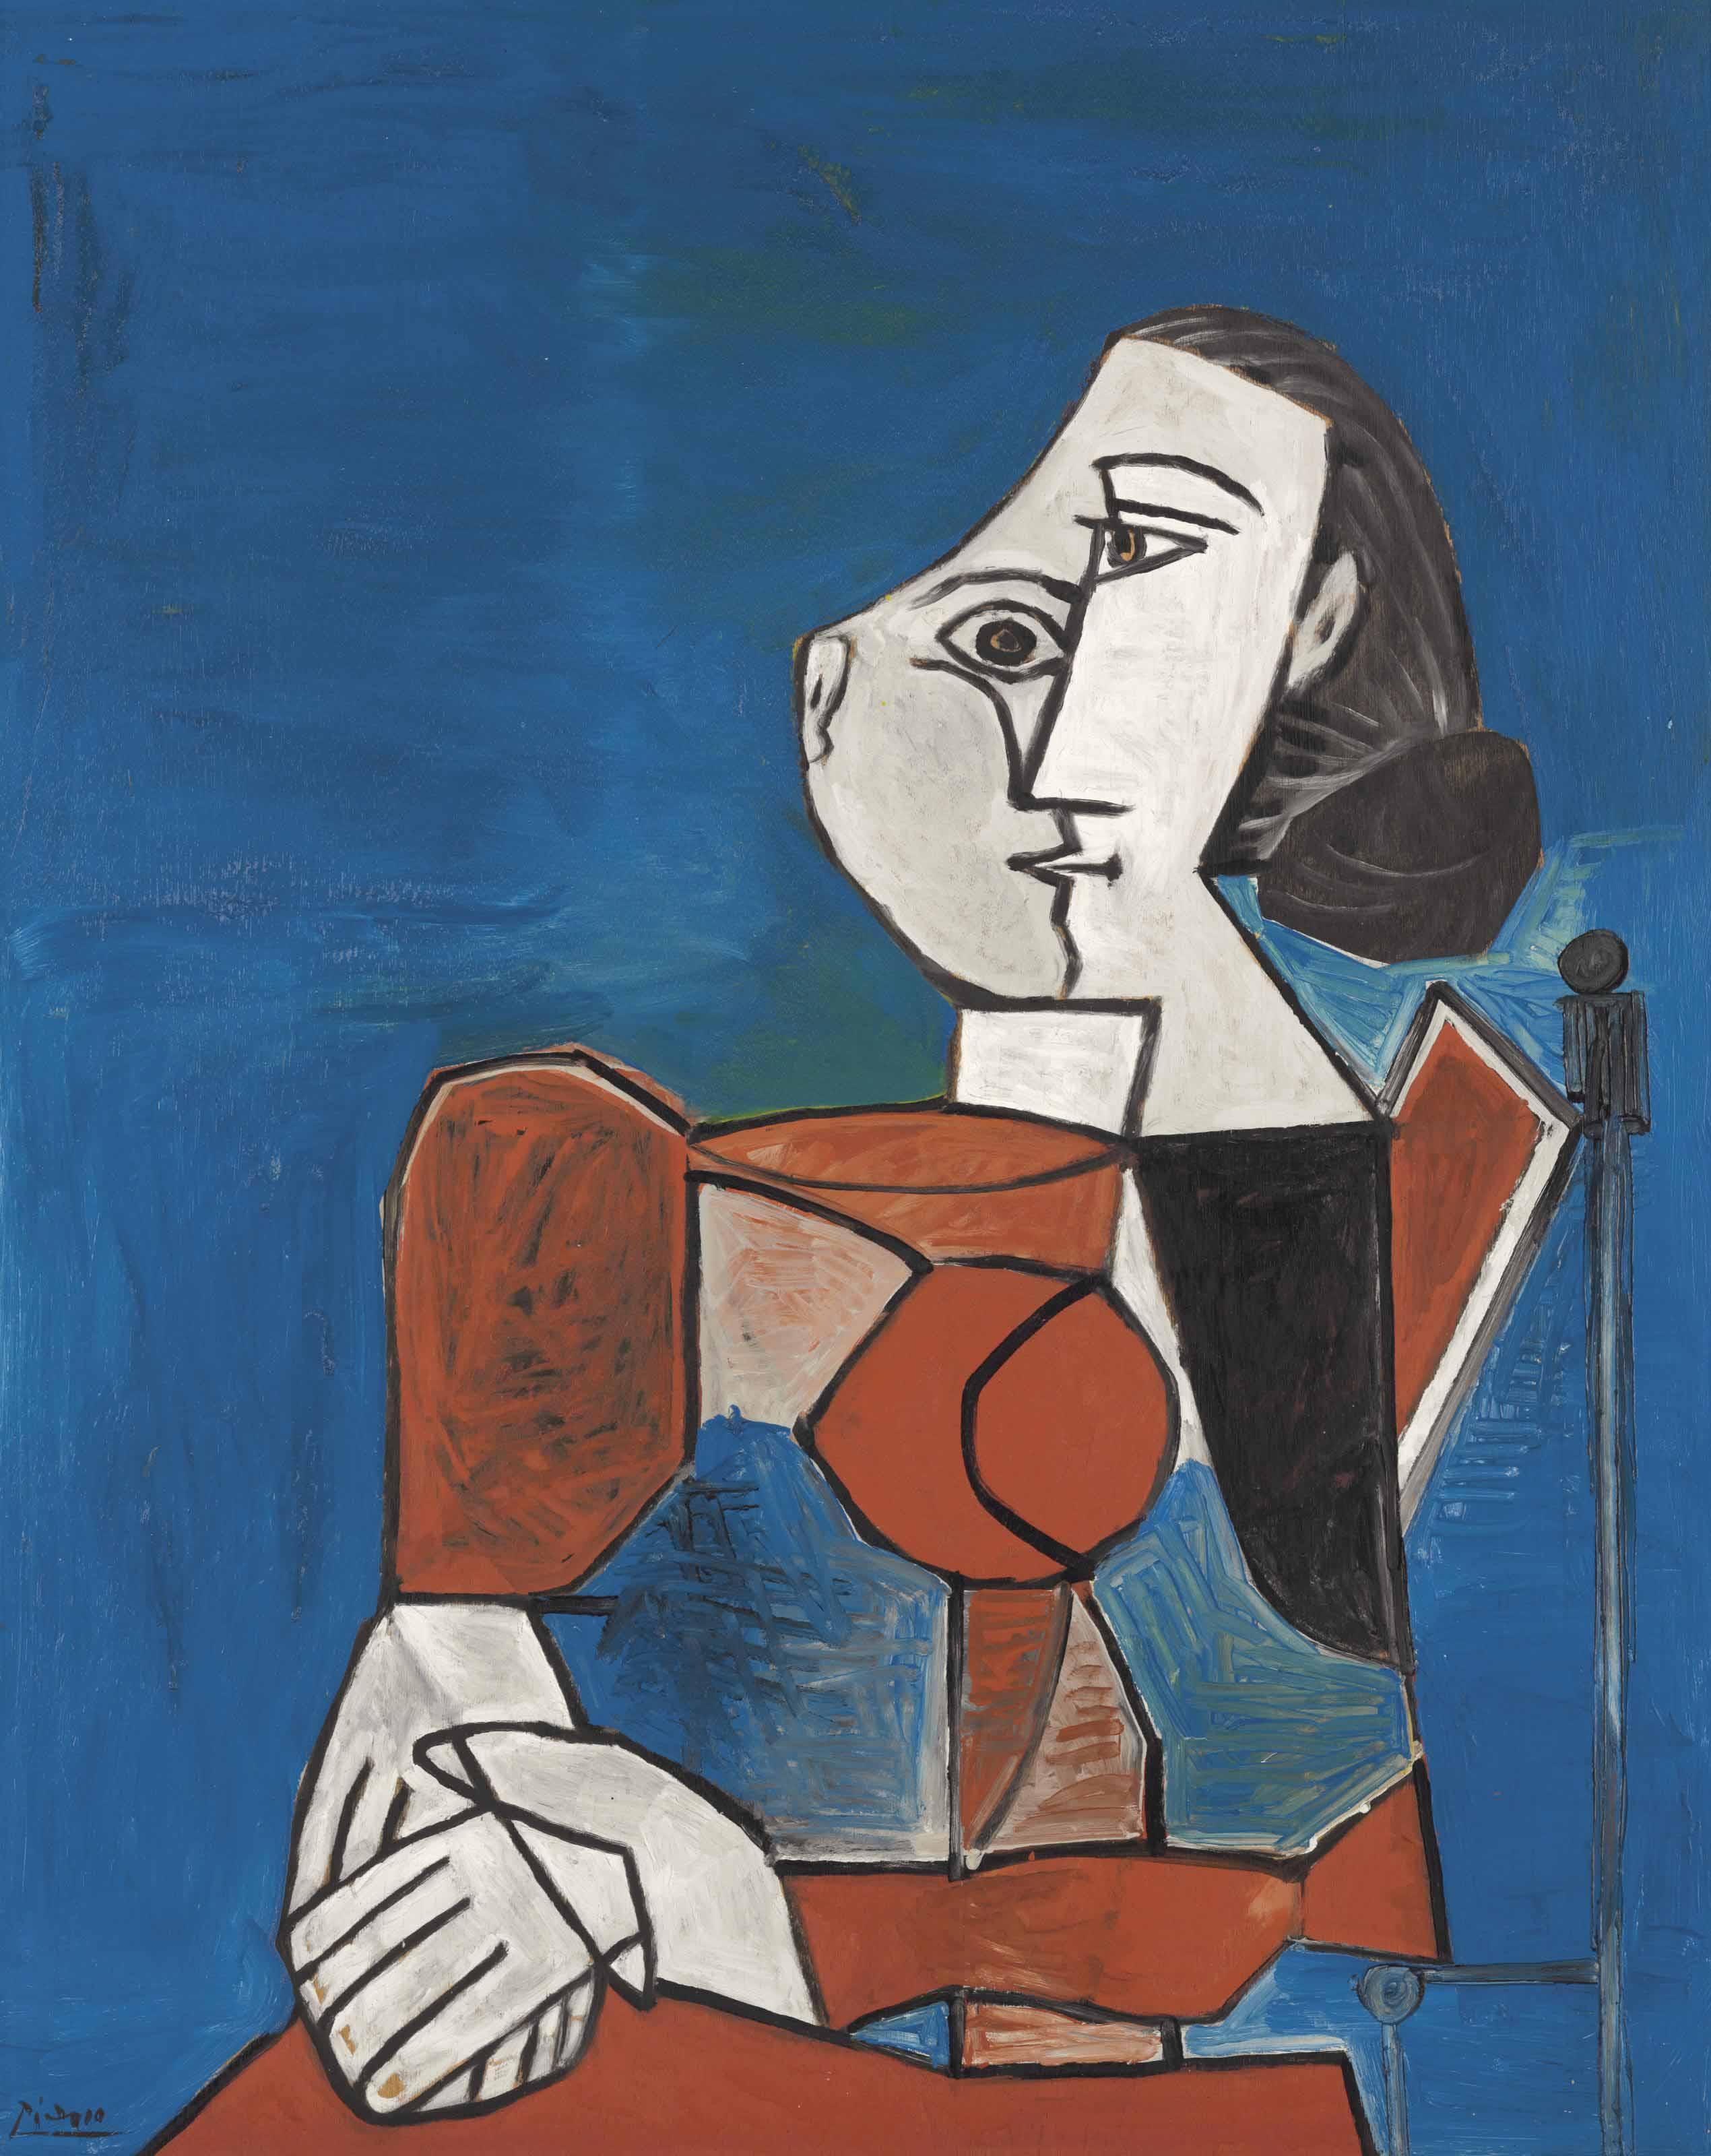 When Bardo met Picasso